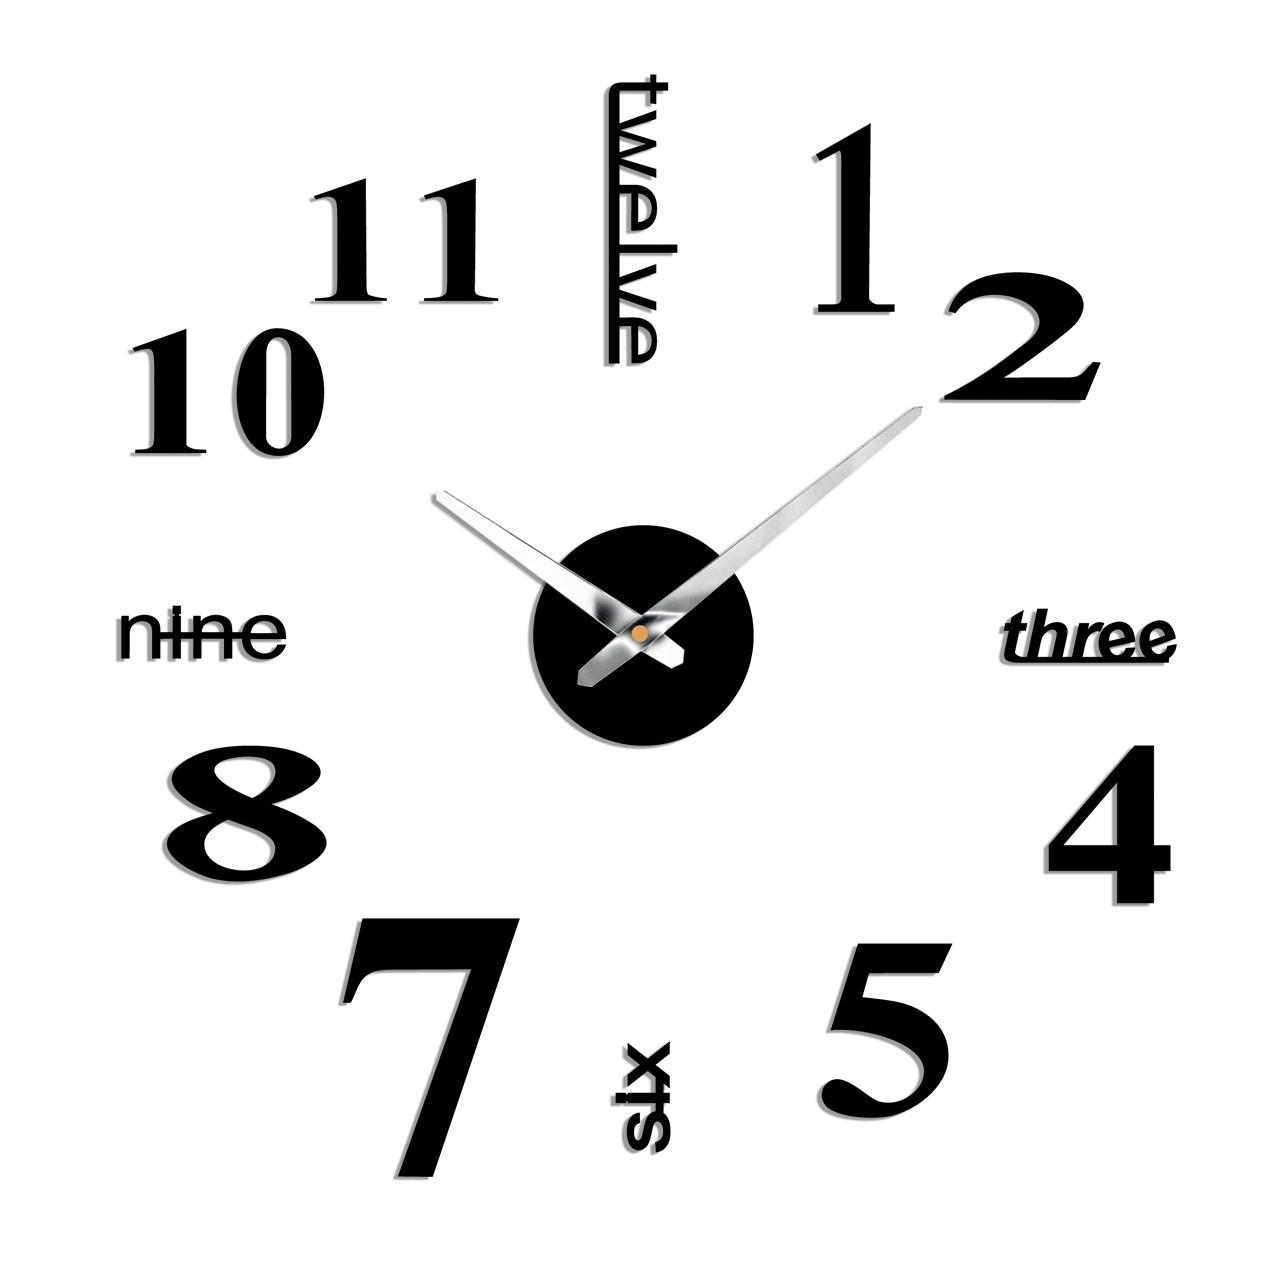 ساعت دیواری پدیده شاپ مدل Number